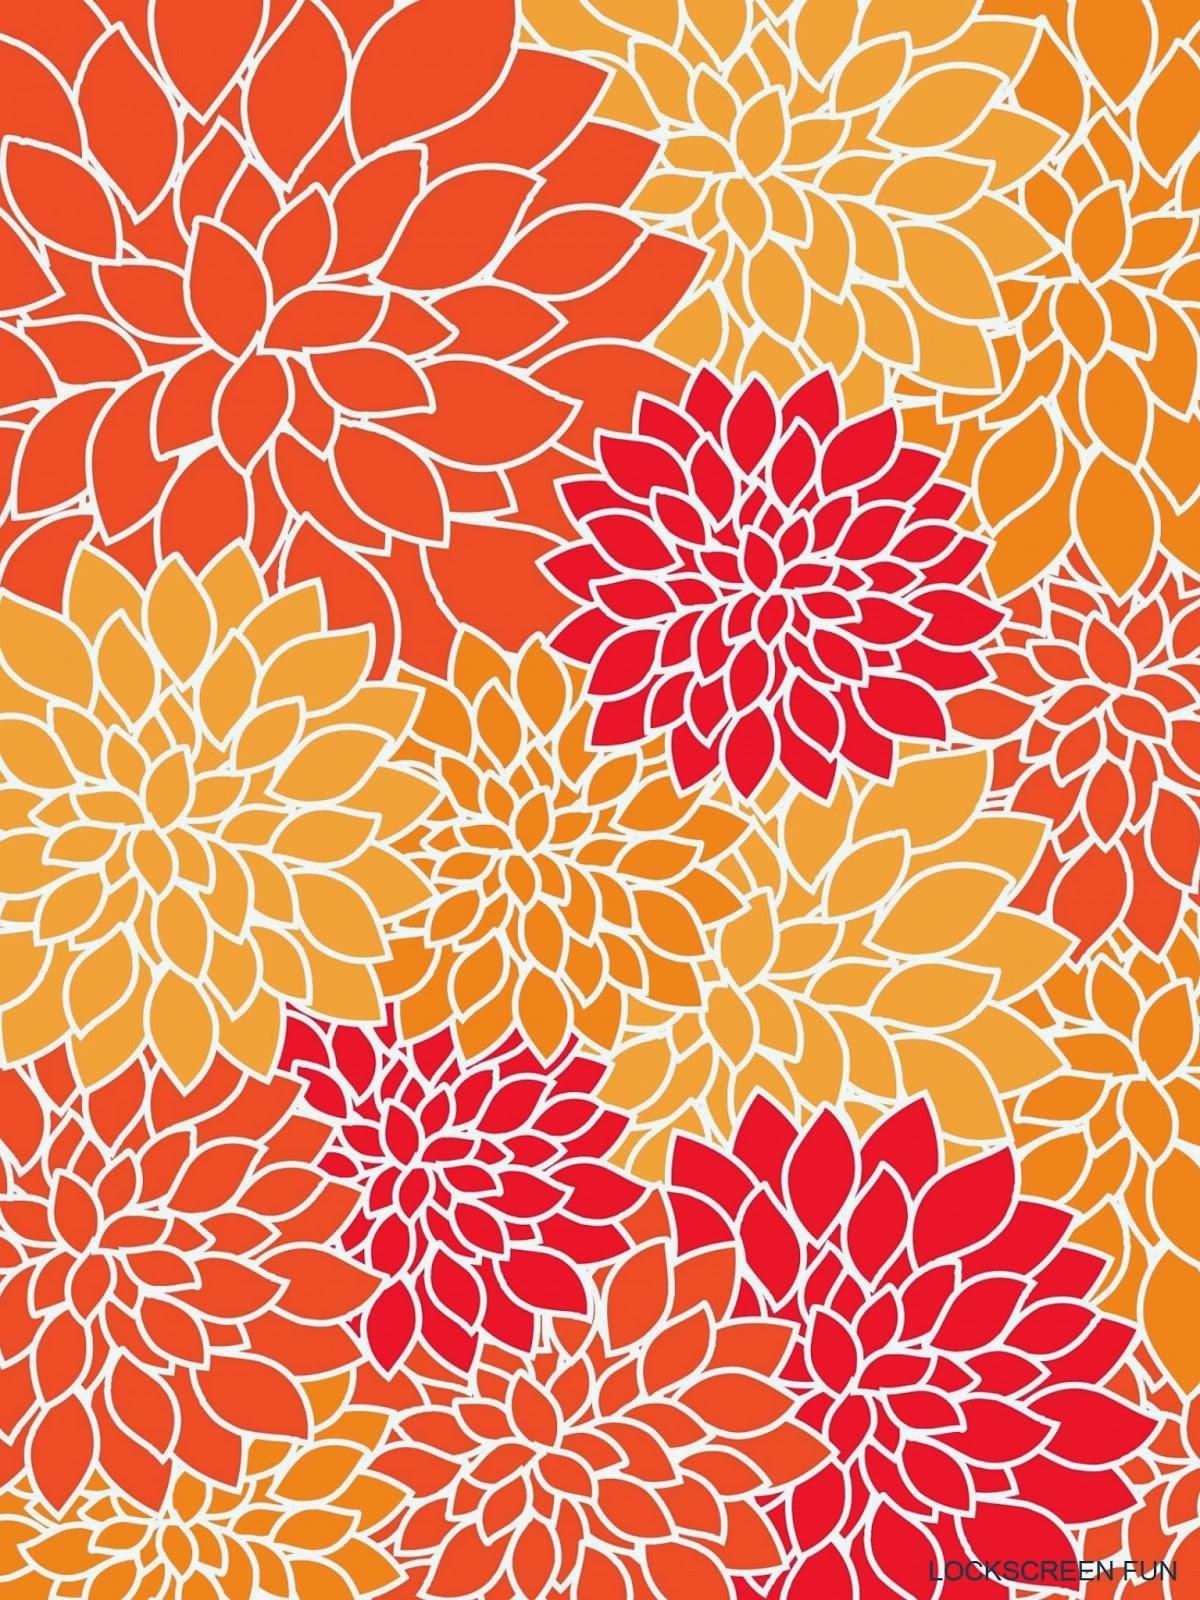 Free Download Flower Print Ipad Mini Background Wallpaper Freejpg